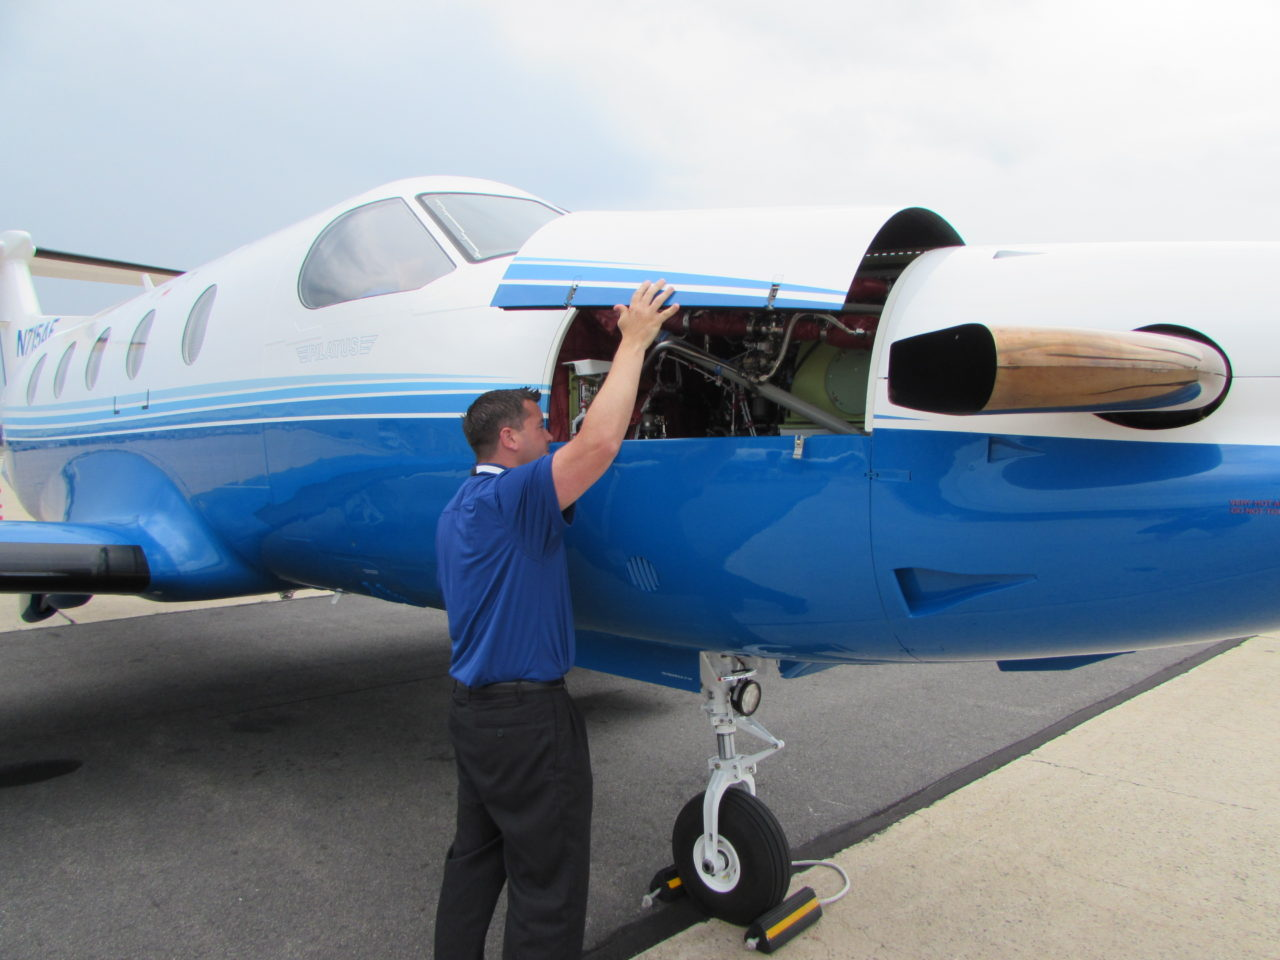 PlaneSense mechanics